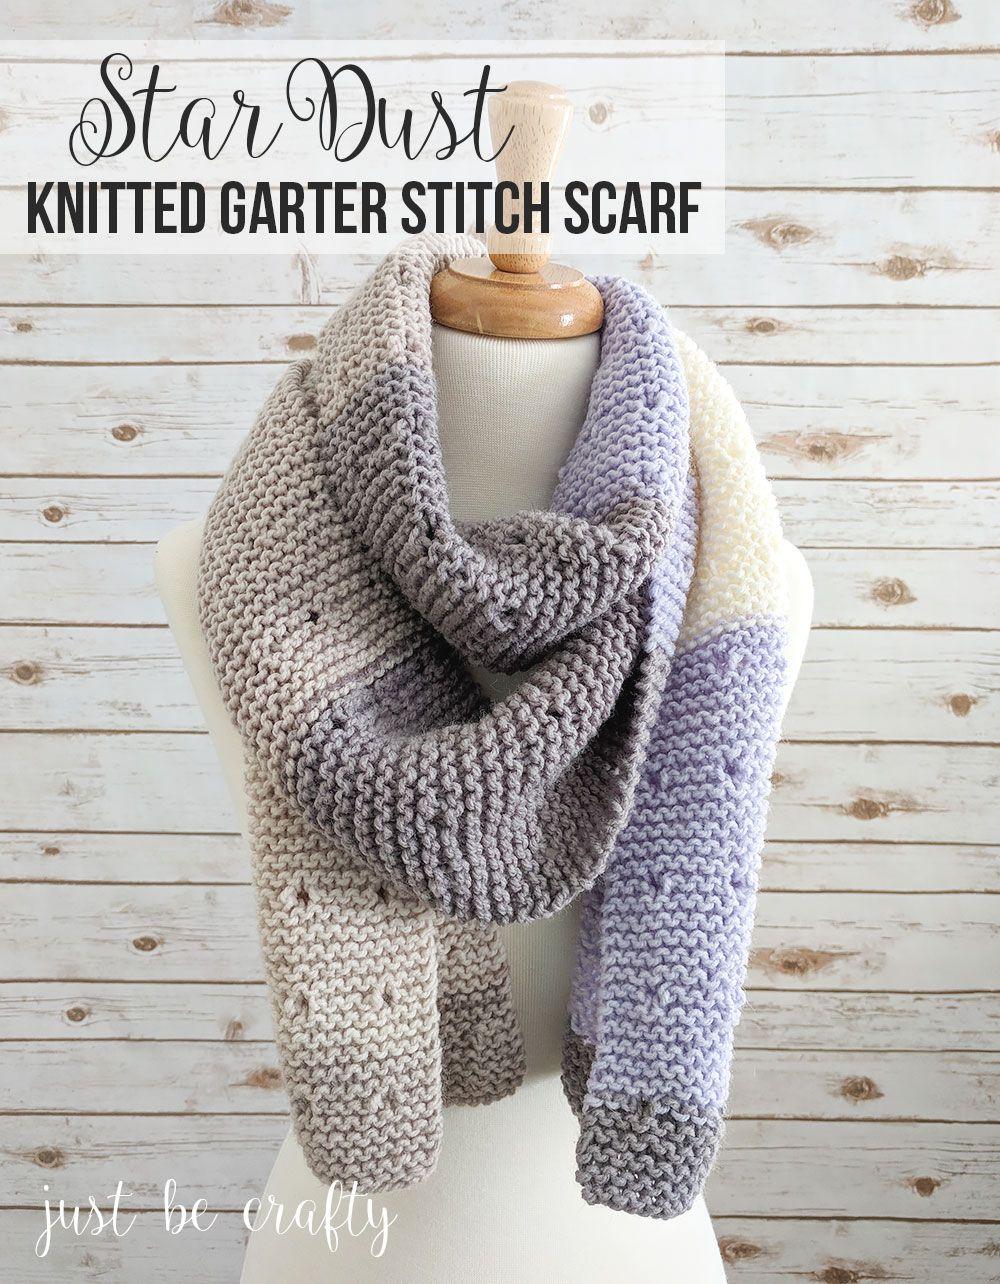 Star Dust Knitted Garter Stitch Scarf Pattern Moogly Community